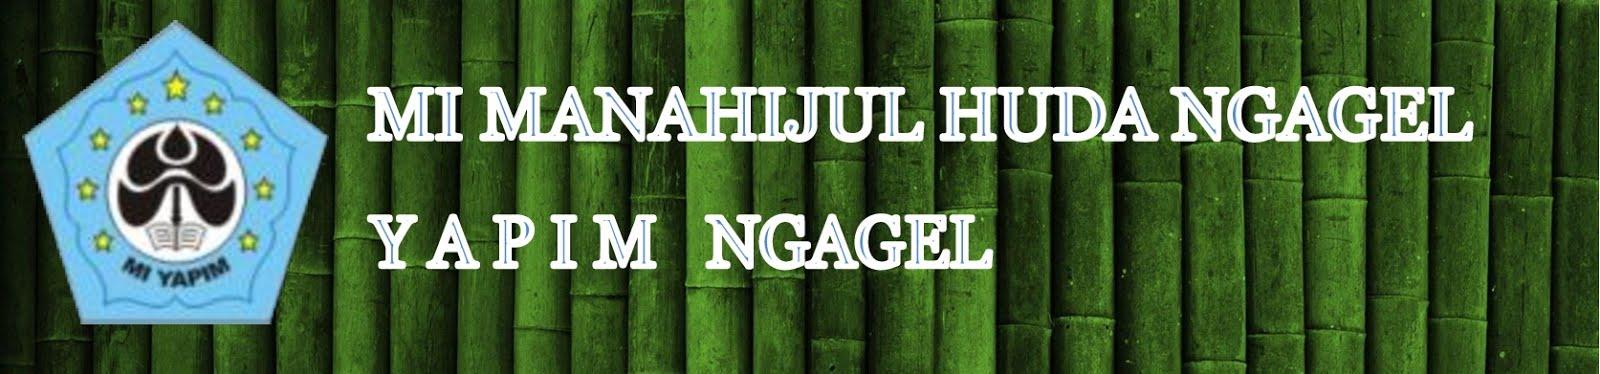 BLOG RESMI MI MANAHIJUL HUDA NGAGEL / YAPIM NGAGEL